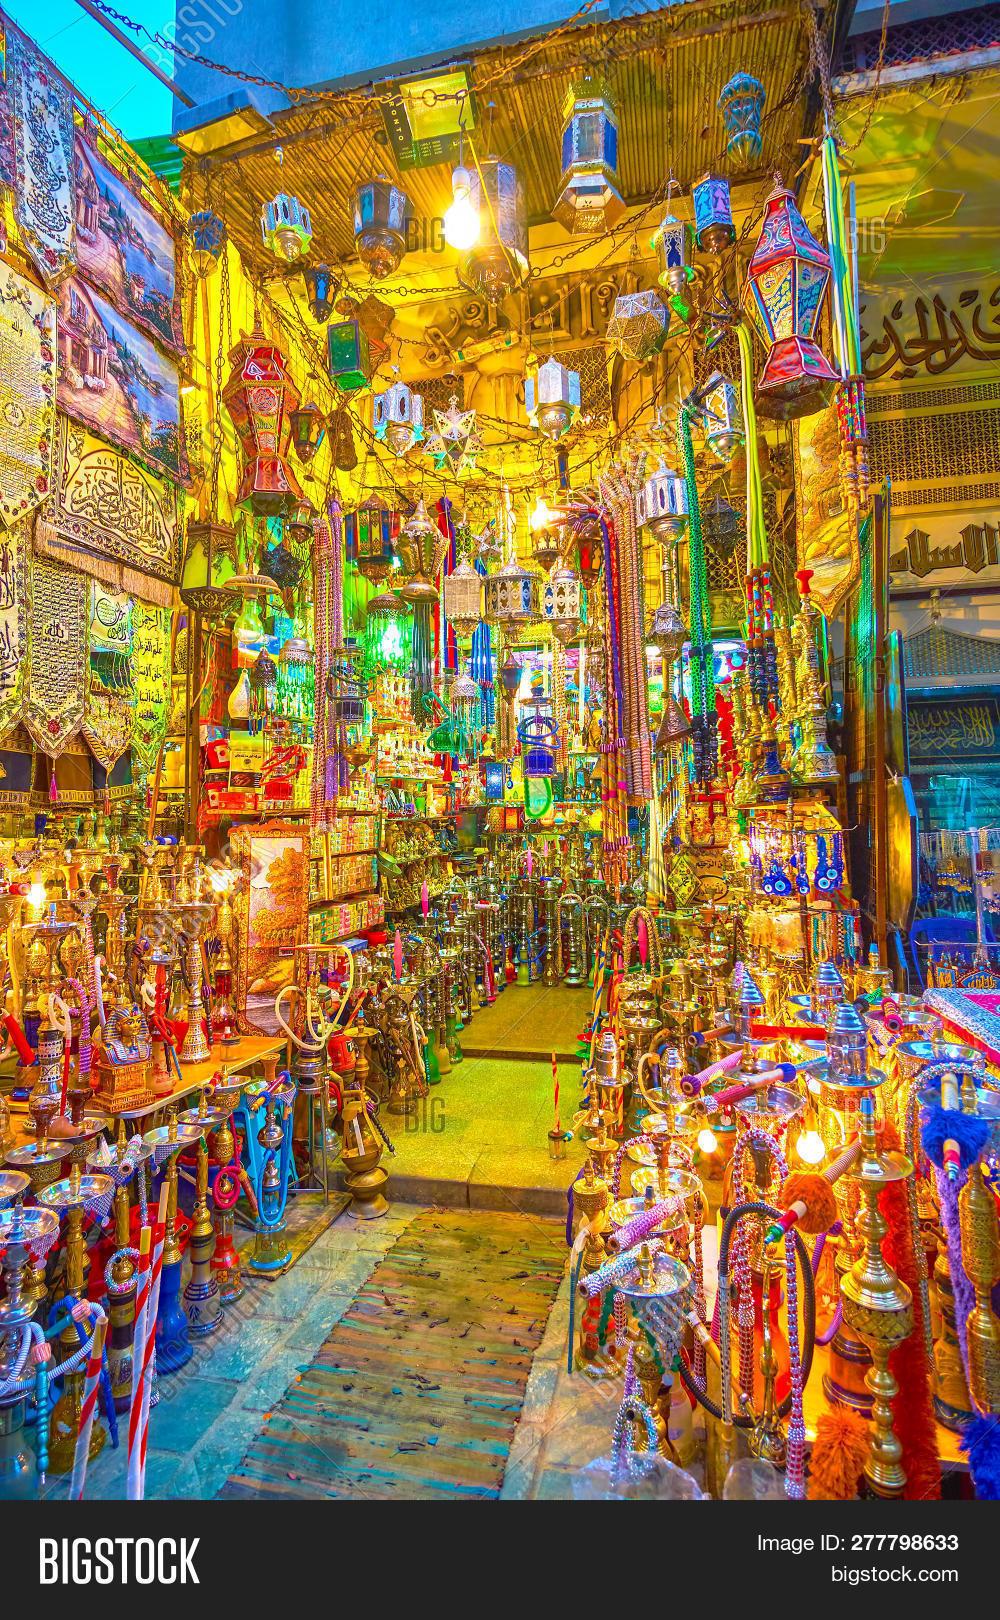 Cairo, Egypt - Image & Photo (Free Trial)   Bigstock